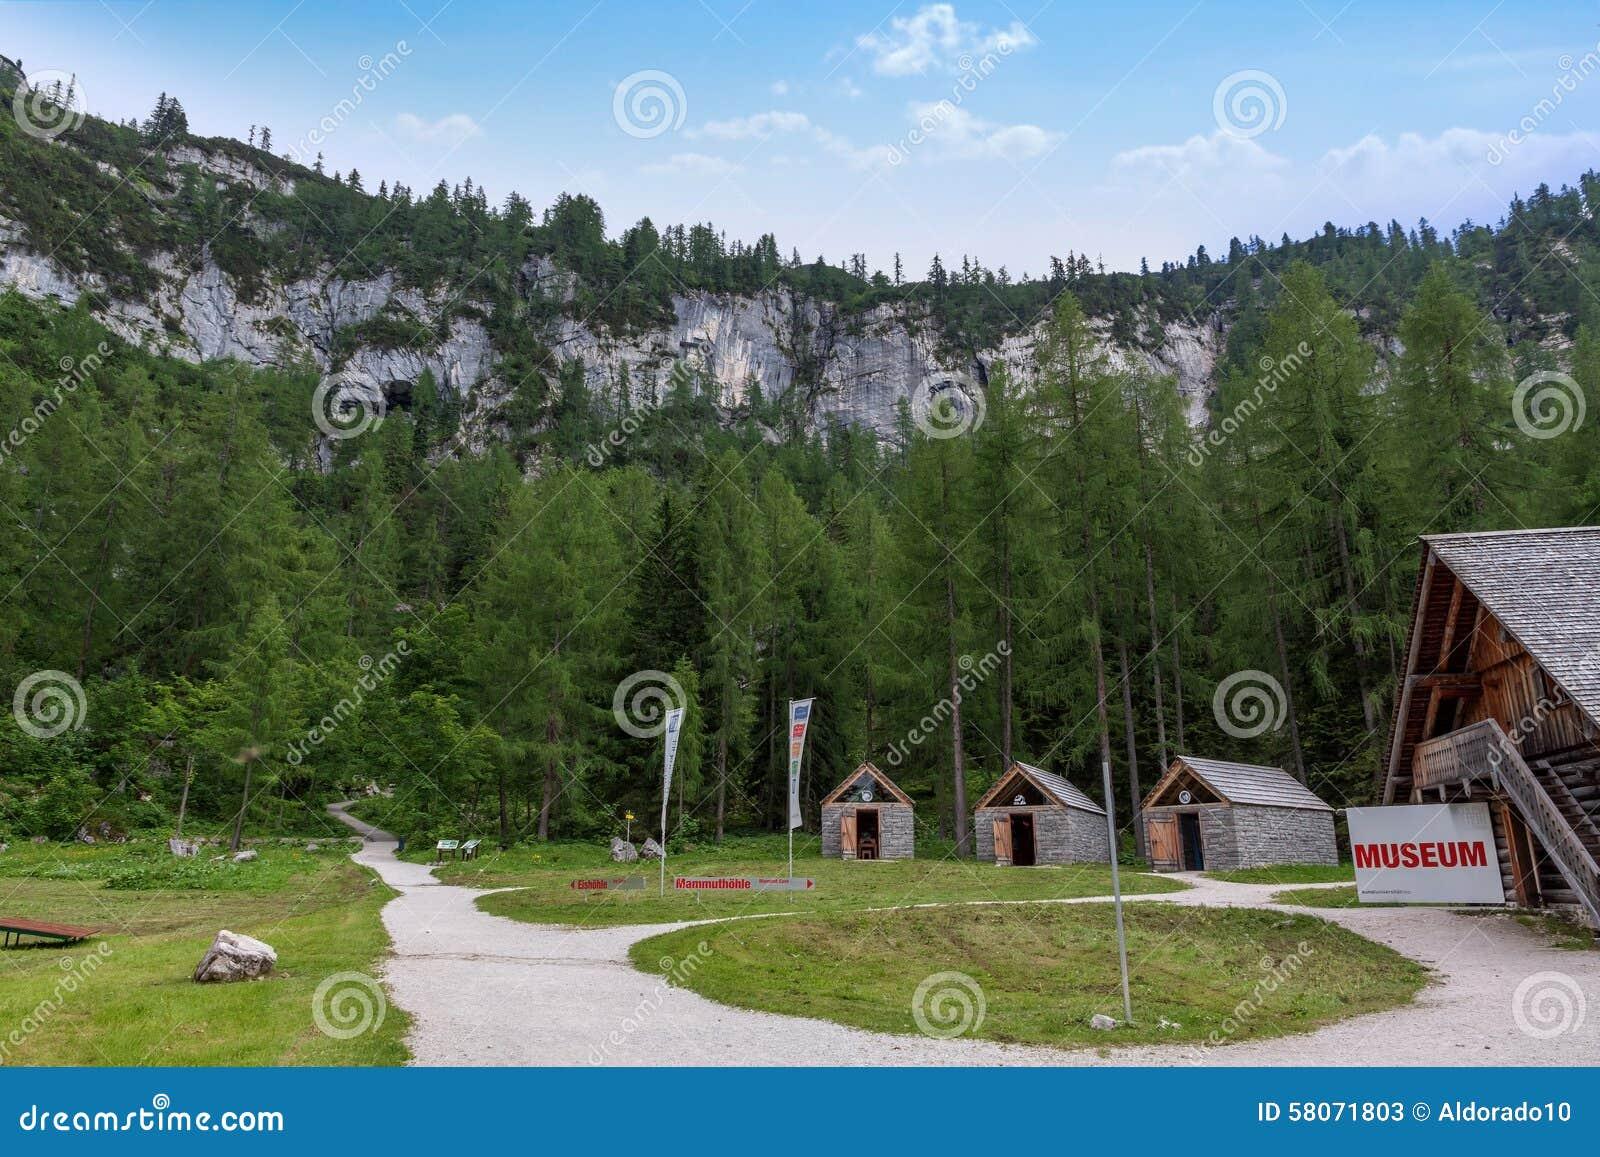 Musée de Dachstein, caverne